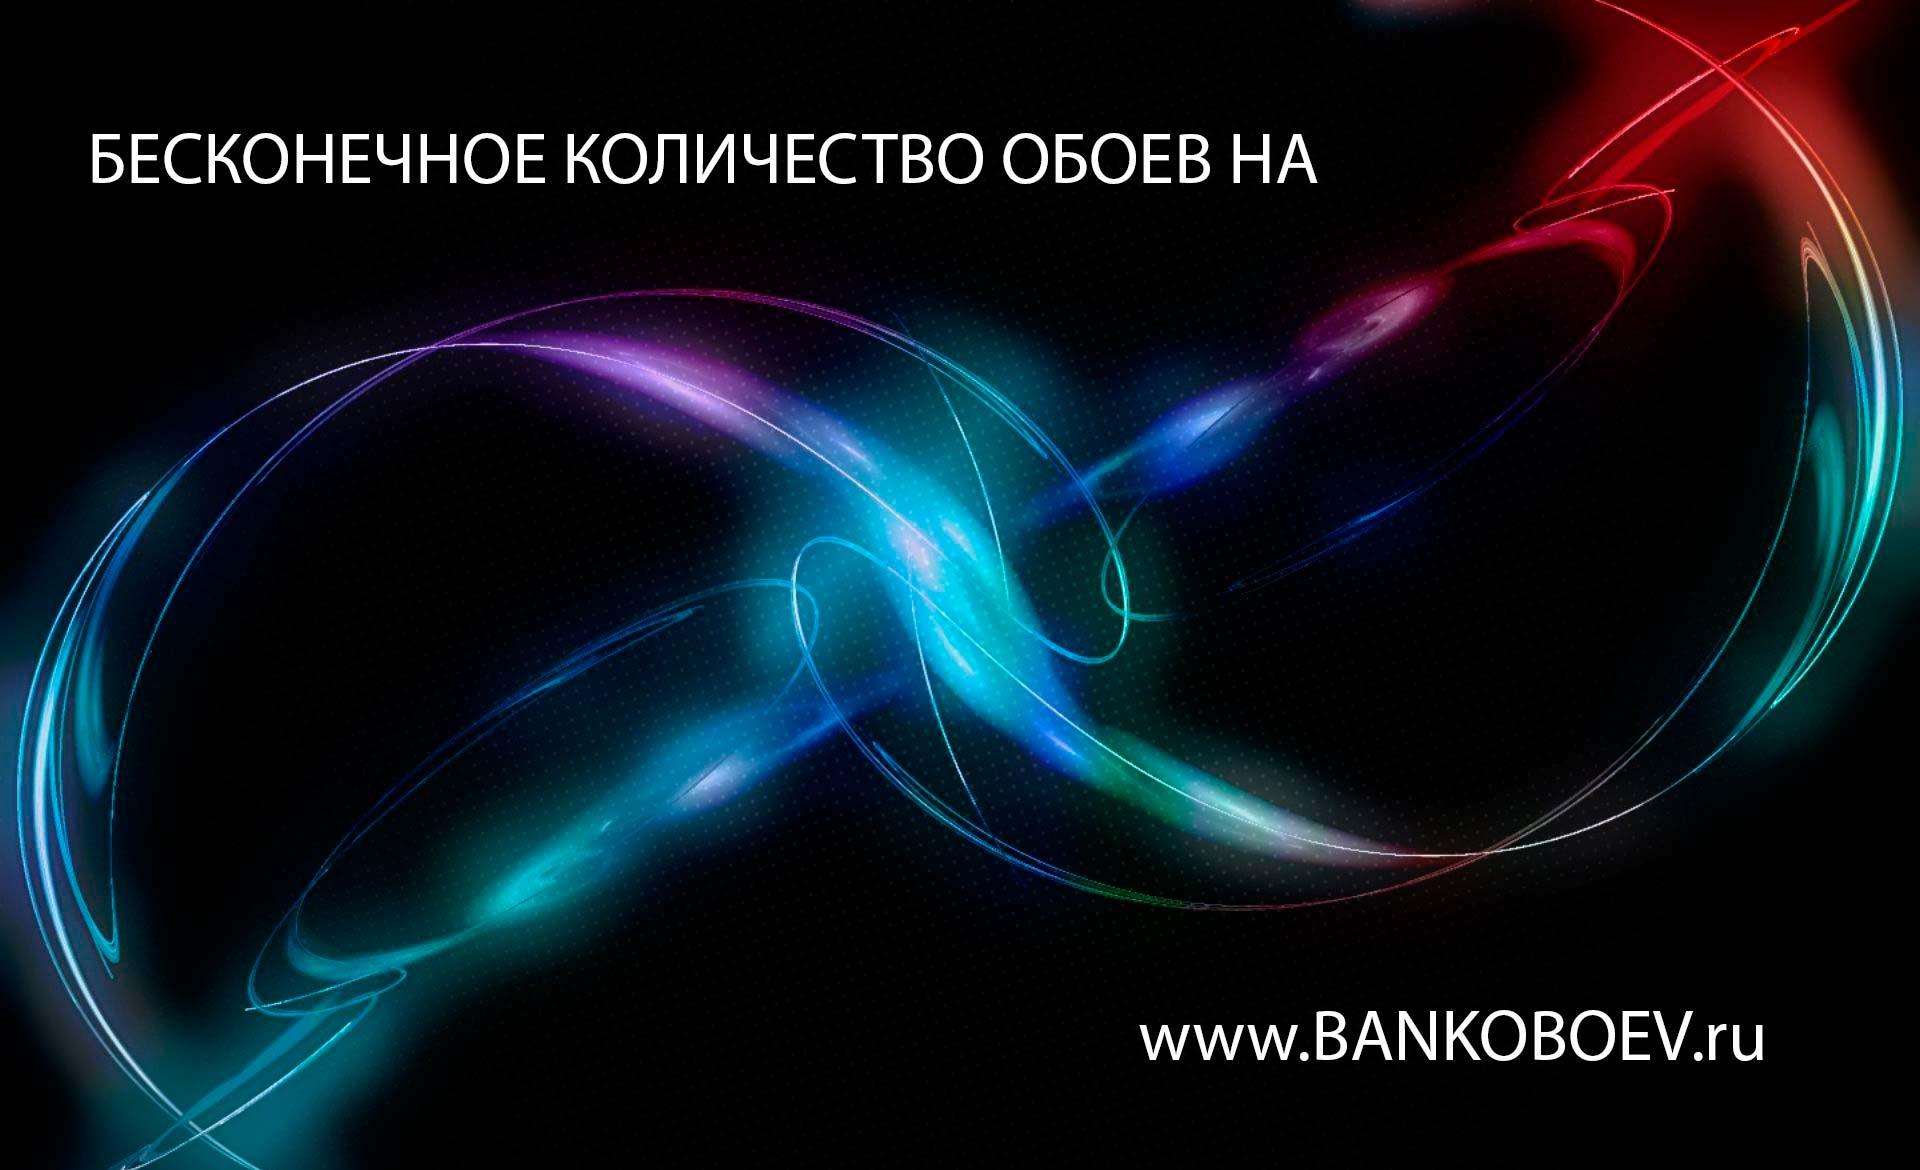 HQ wallpaper Volt   Hamster 1280 x 1024 on the desktop high quality 1600x1200